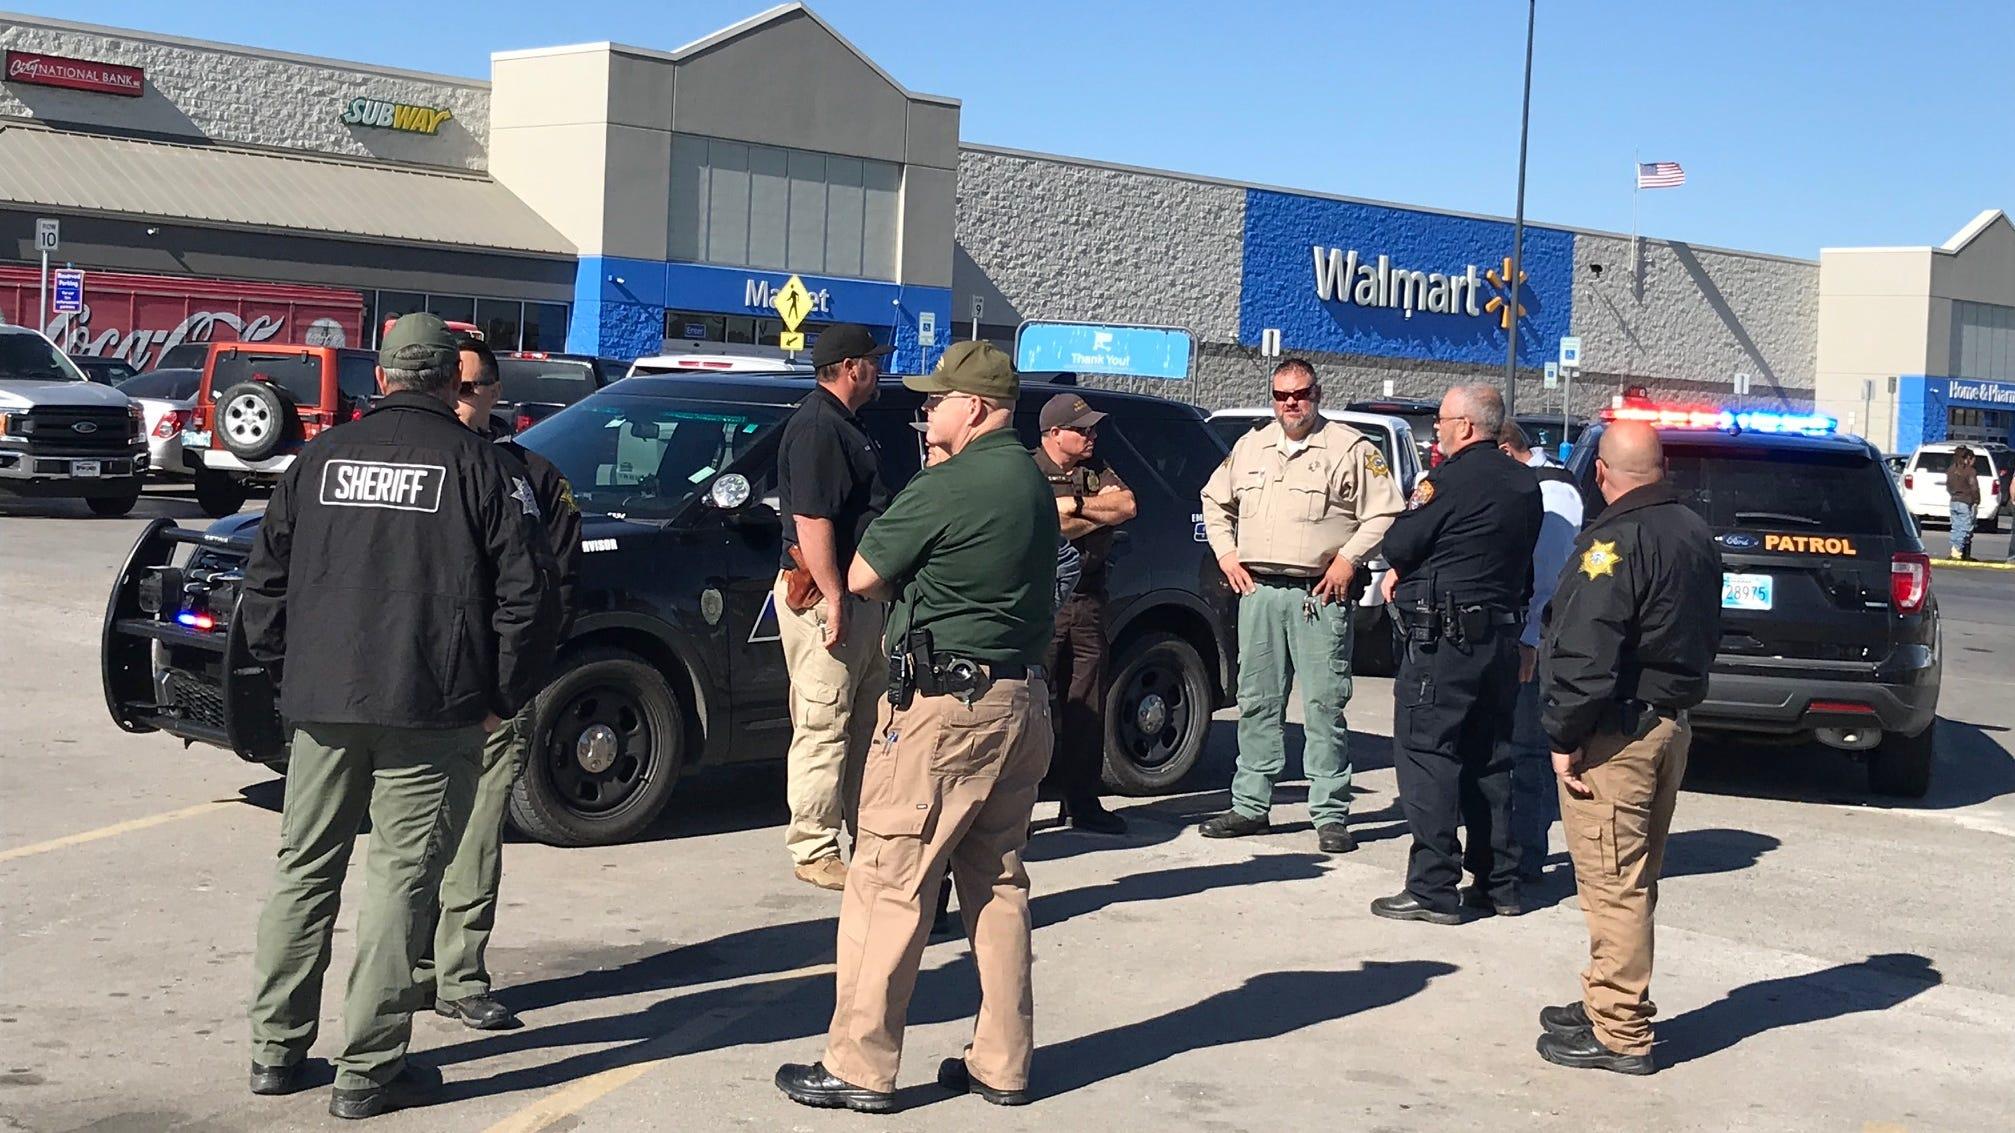 3 dead in shooting at Walmart in Oklahoma